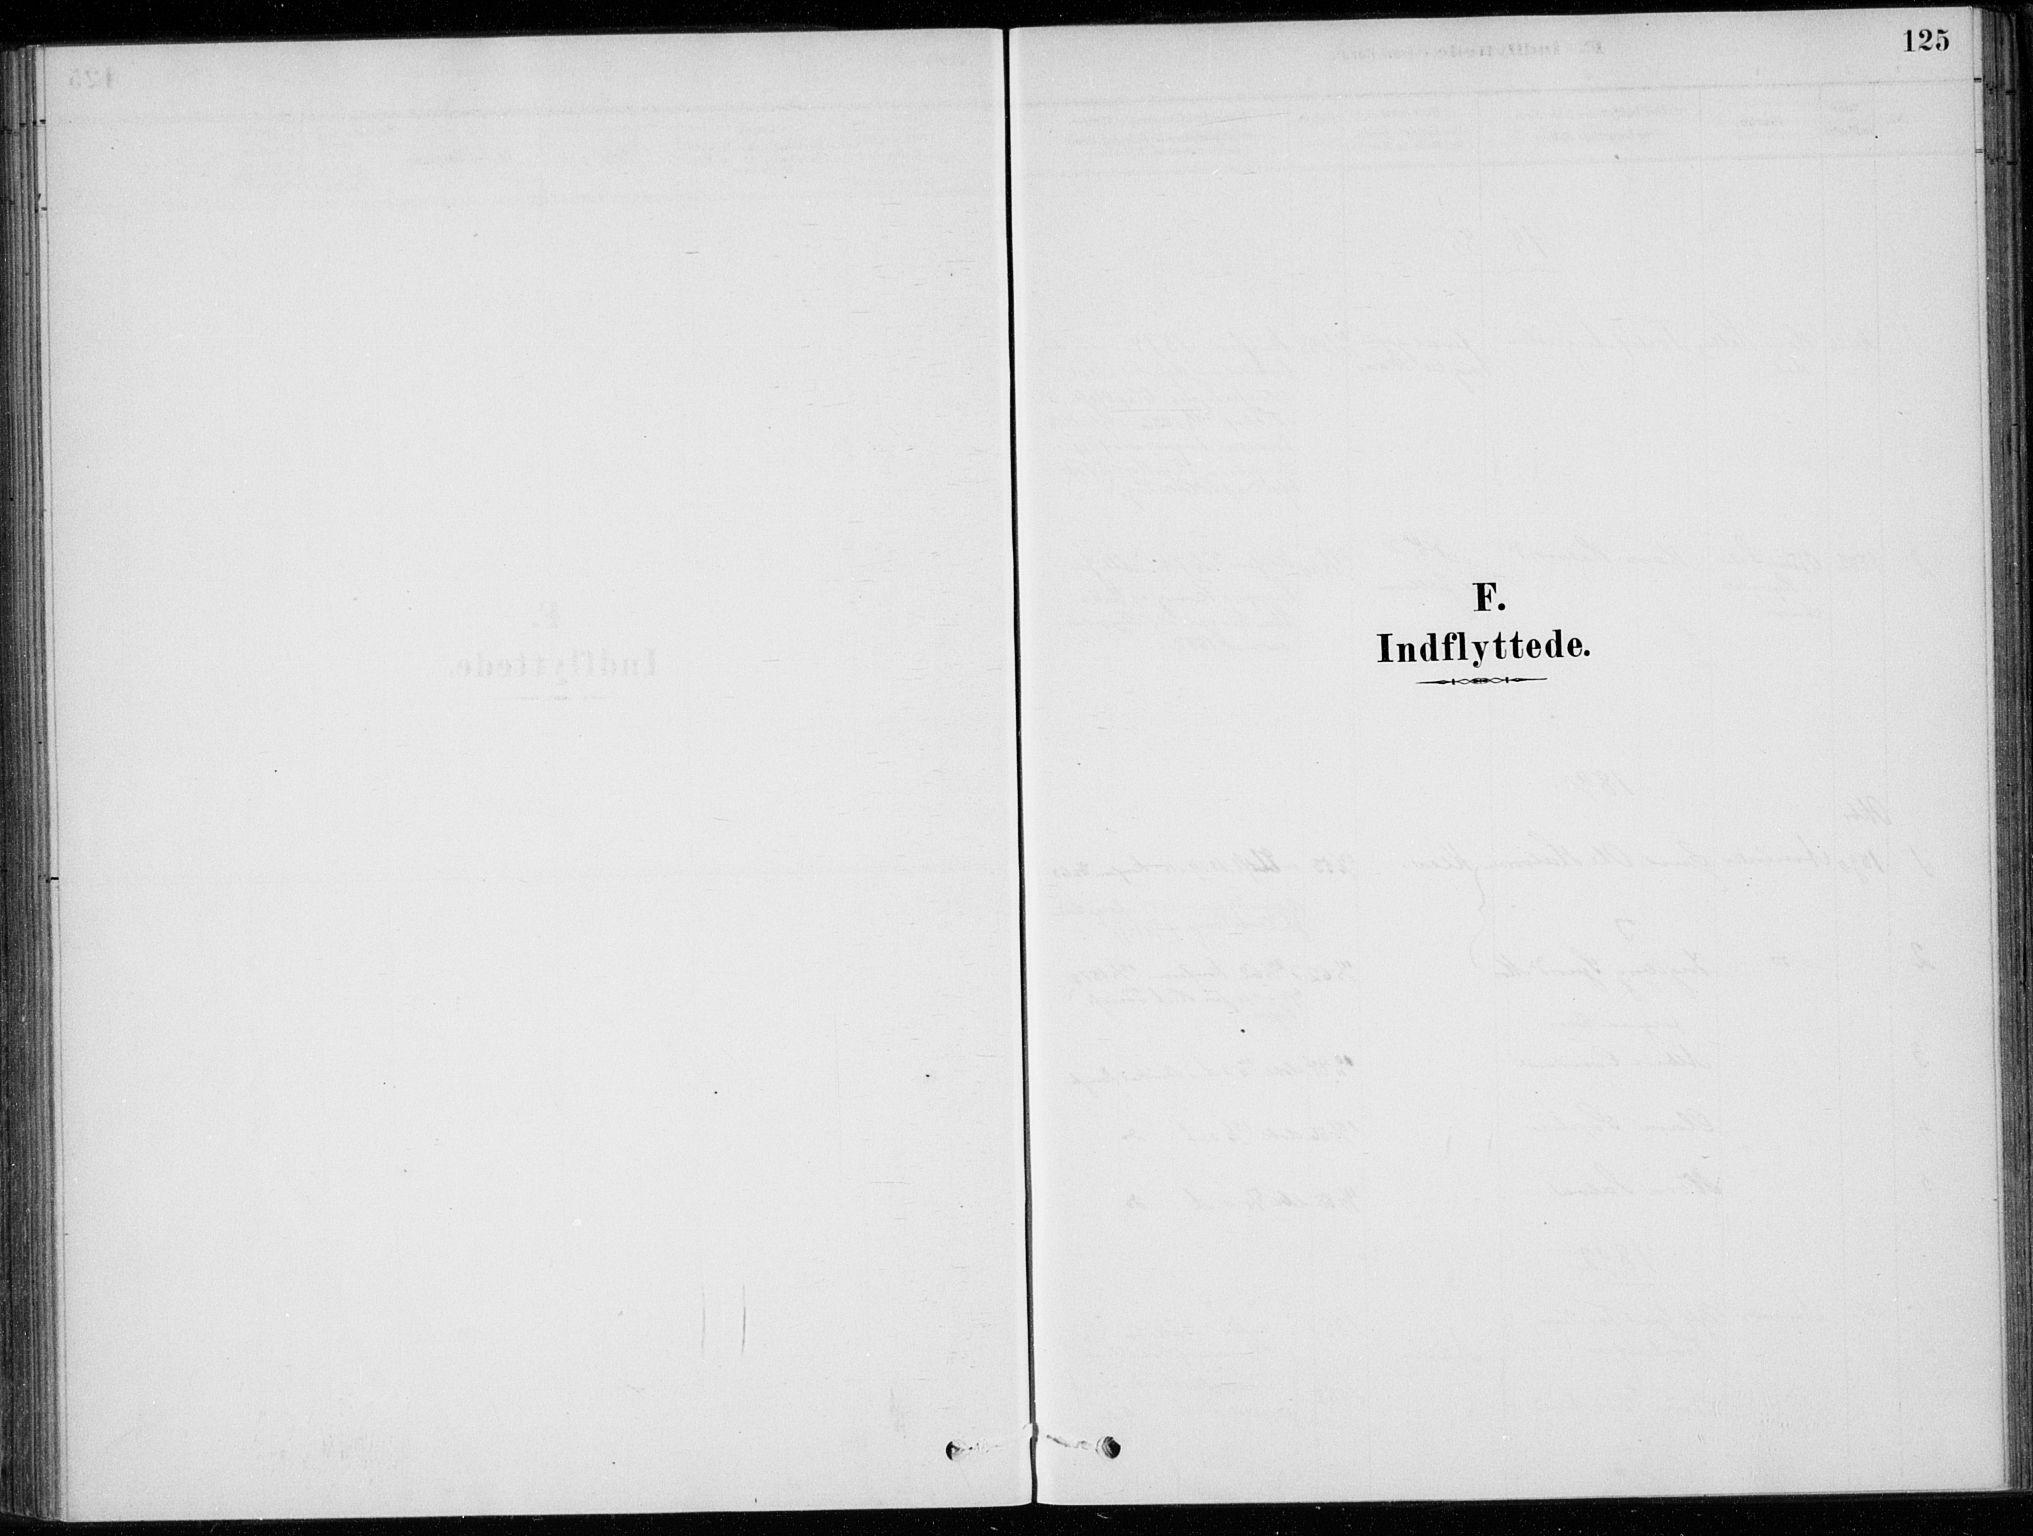 SAKO, Sigdal kirkebøker, F/Fc/L0001: Ministerialbok nr. III 1, 1879-1893, s. 125